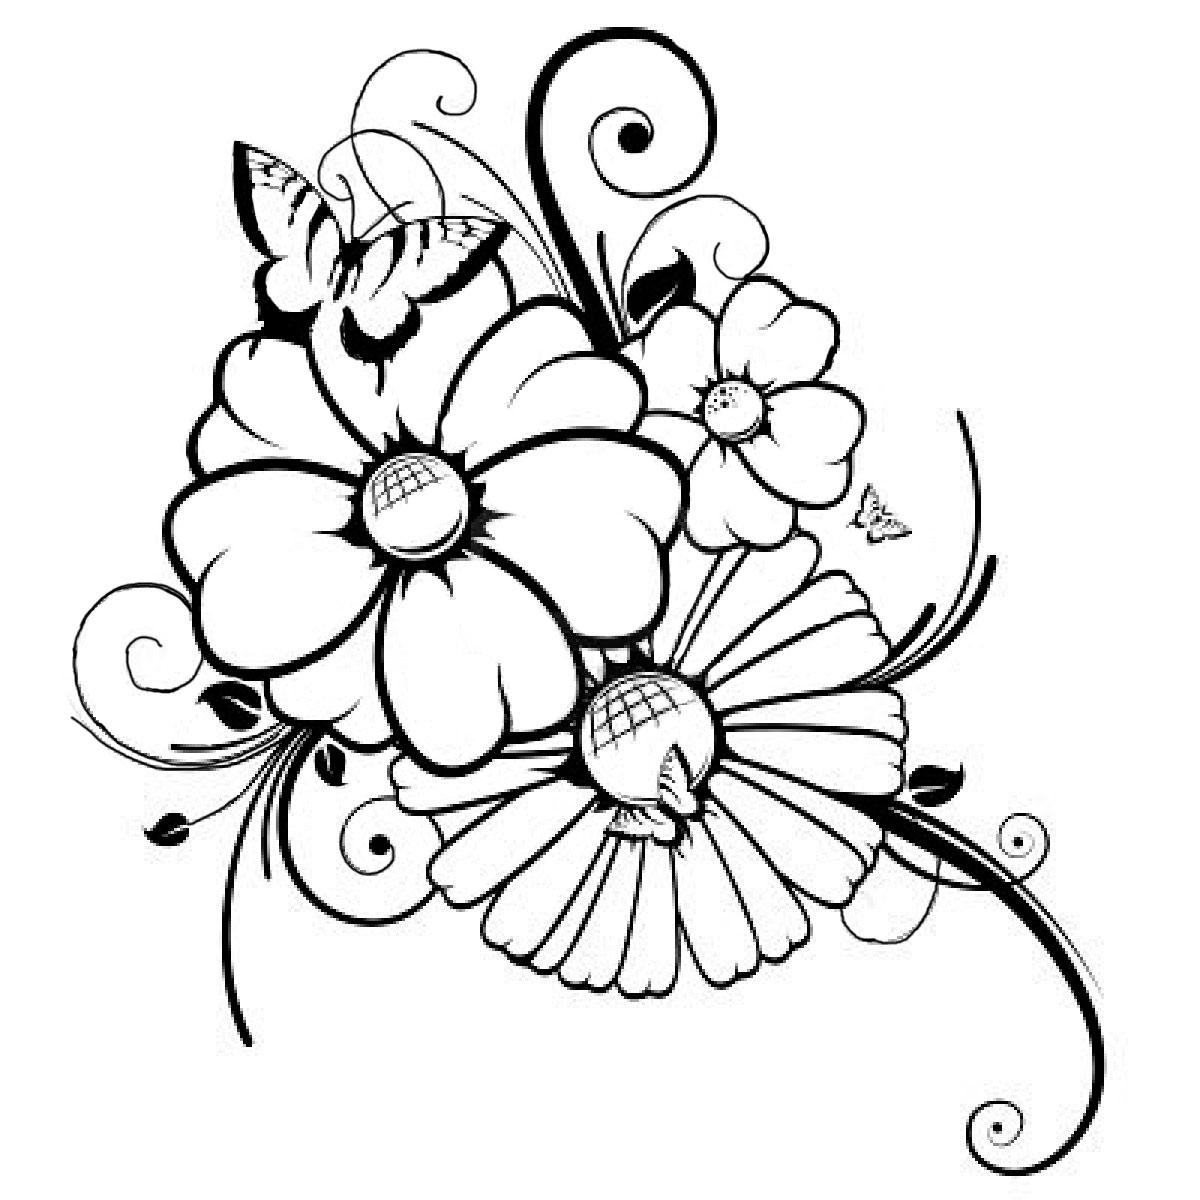 Ausmalbilder Gratis Blumen 2 | Ausmalbilder Gratis ganzes Blumen Ausmalbilder Gratis